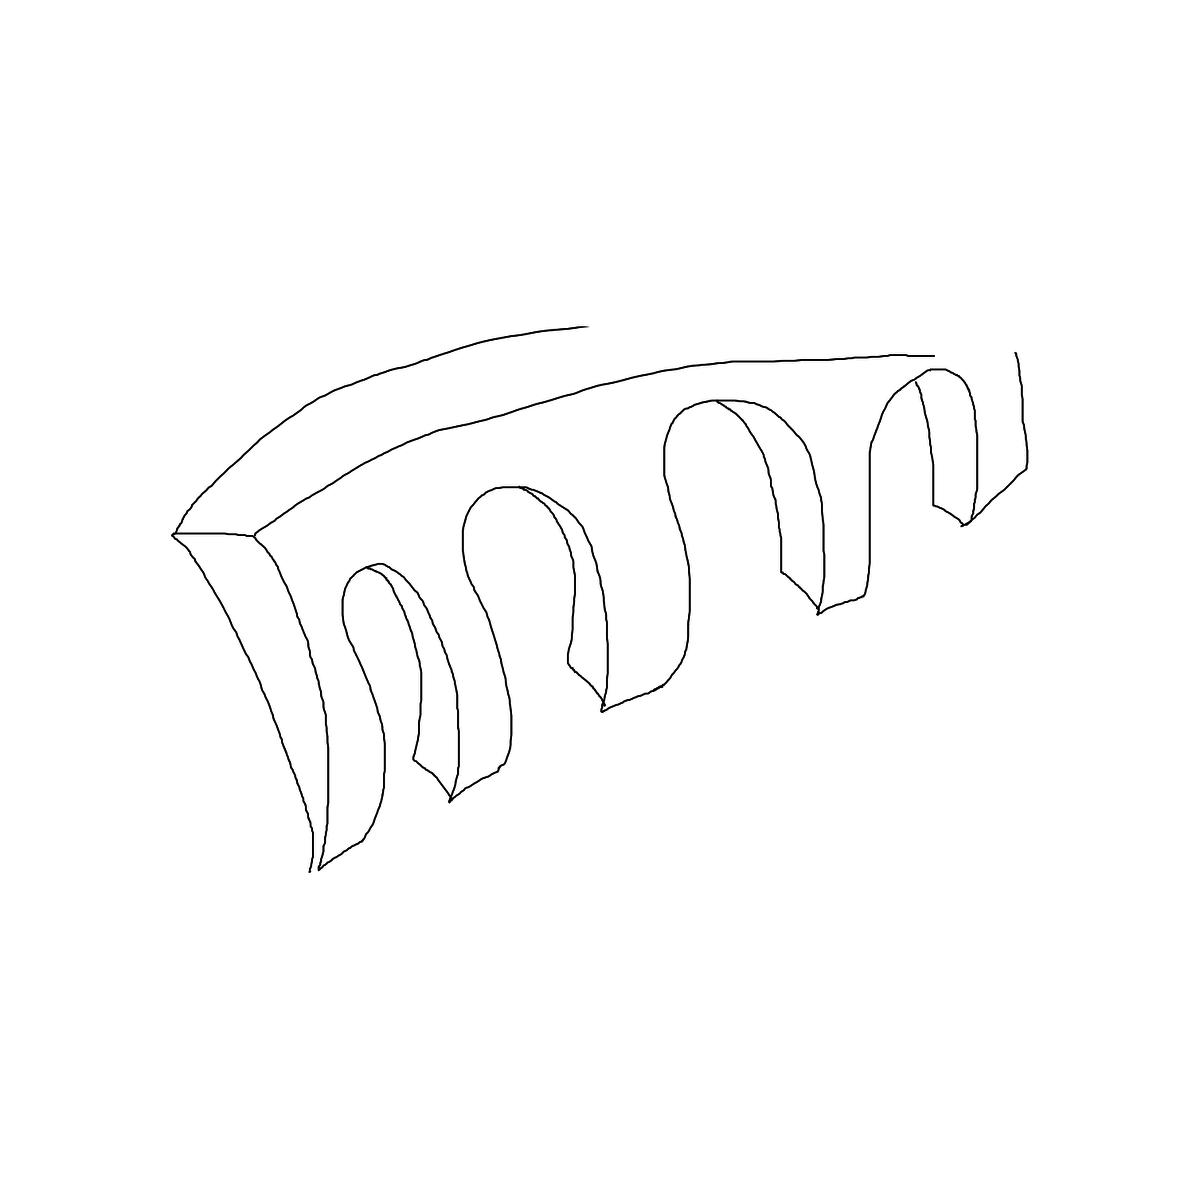 BAAAM drawing#745 lat:40.9635047912597660lng: -4.0978760719299320